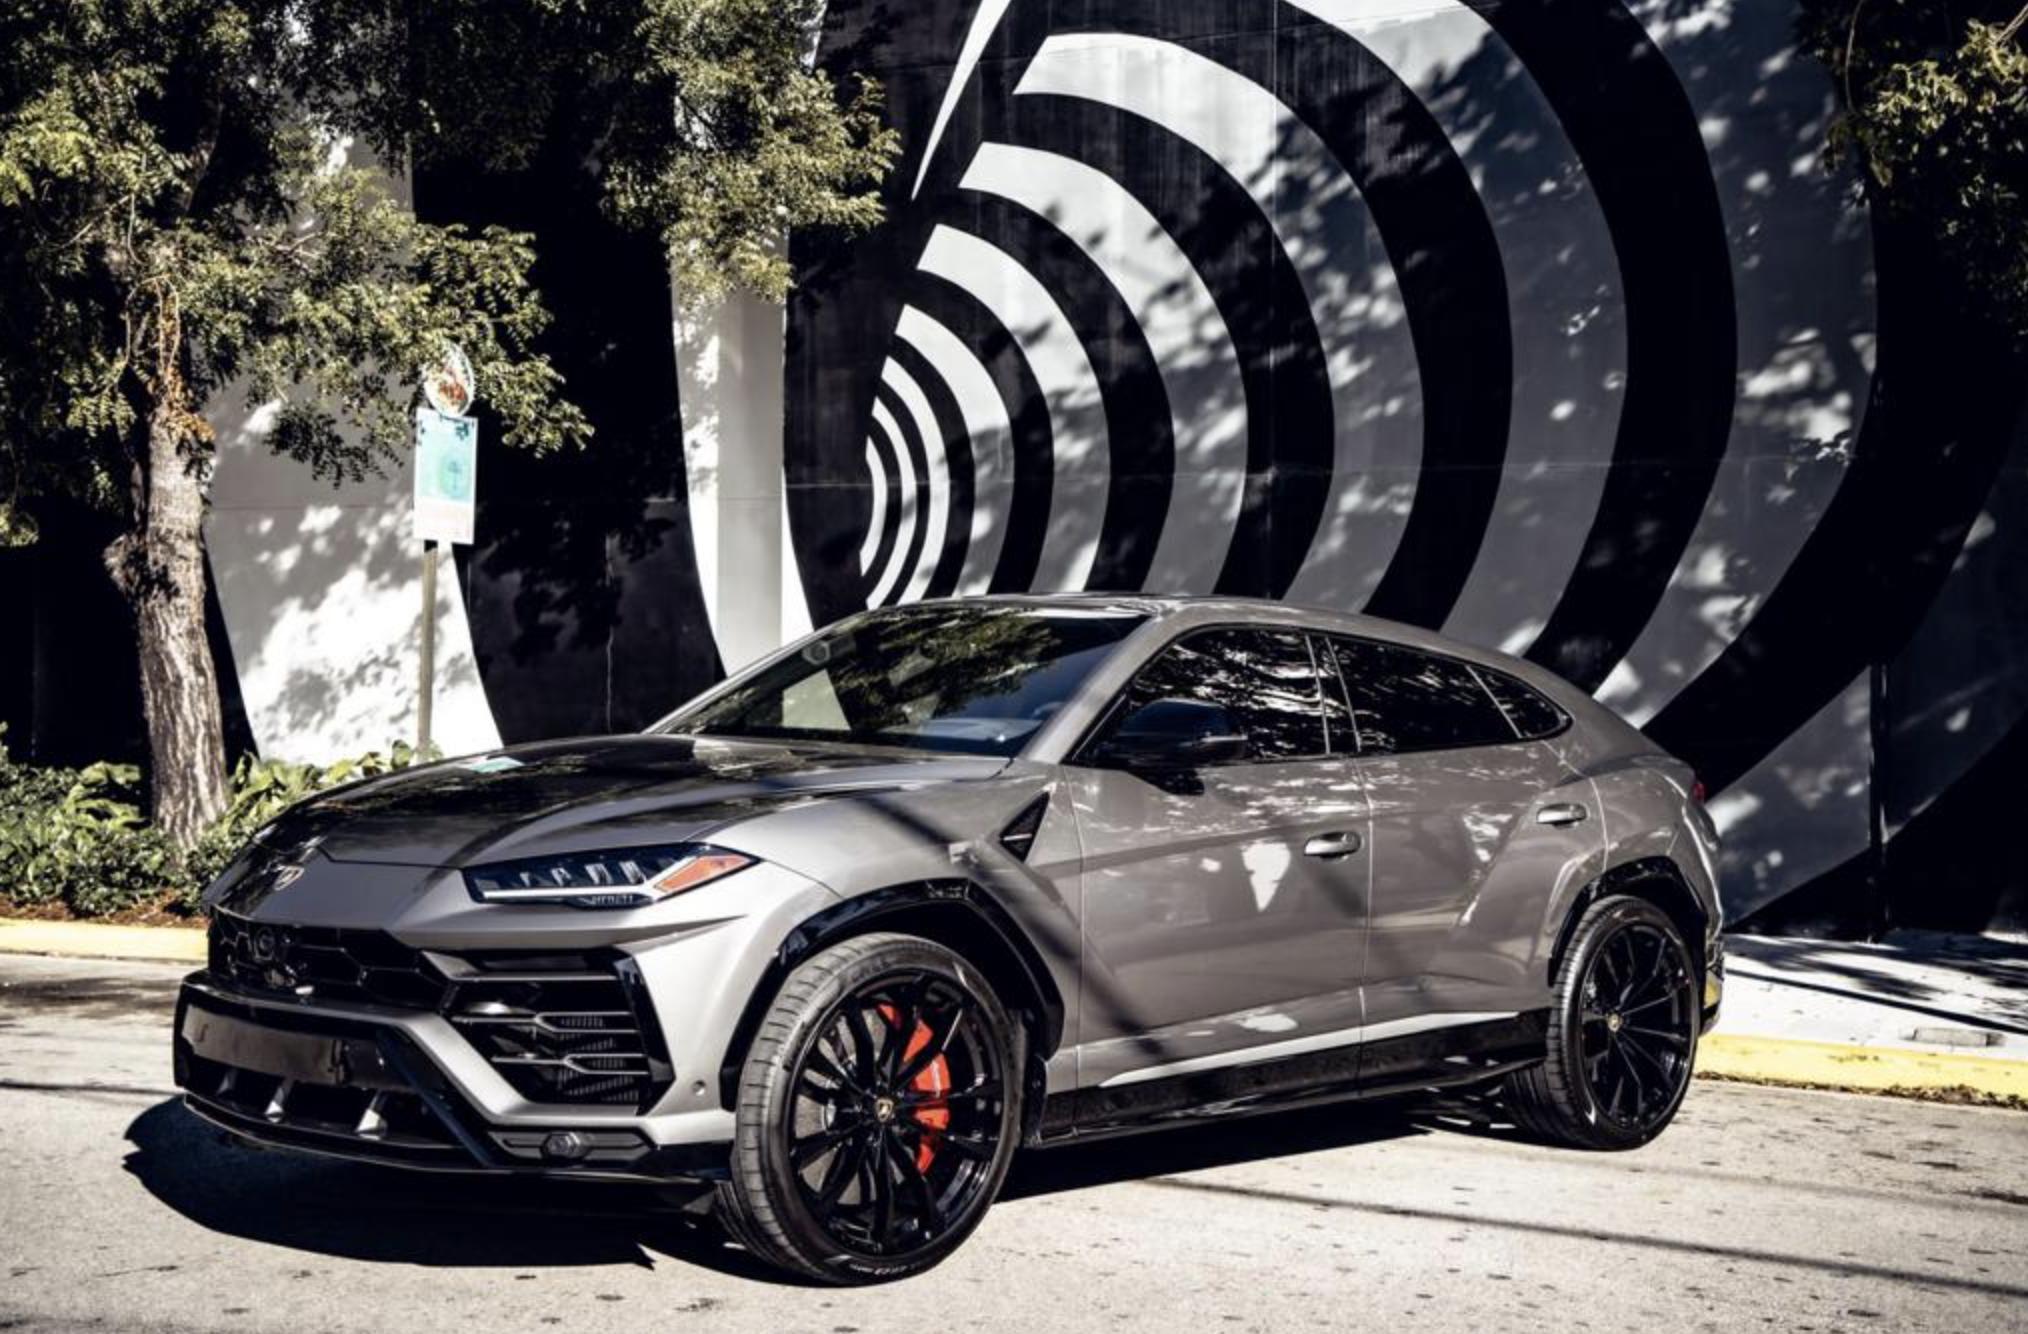 Image #5 of our  2021 Lamborghini Urus - Silver    In Miami Fort Lauderdale Palm Beach South Florida